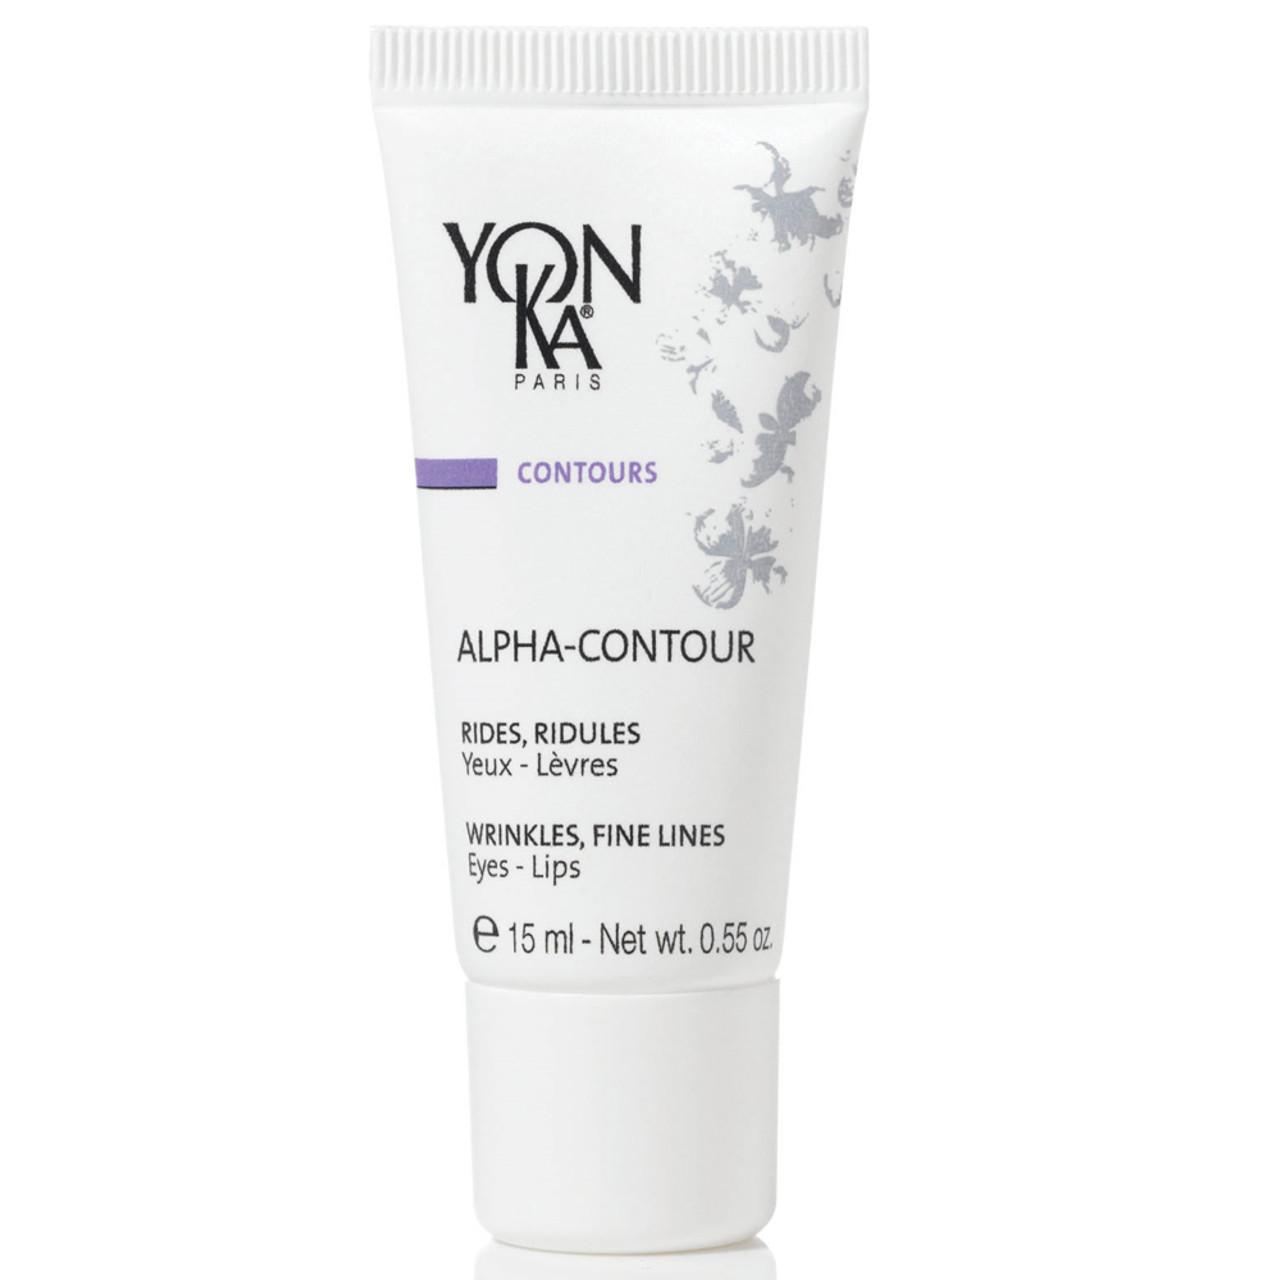 YonKa Alpha-Contour Eye and Lip Gel